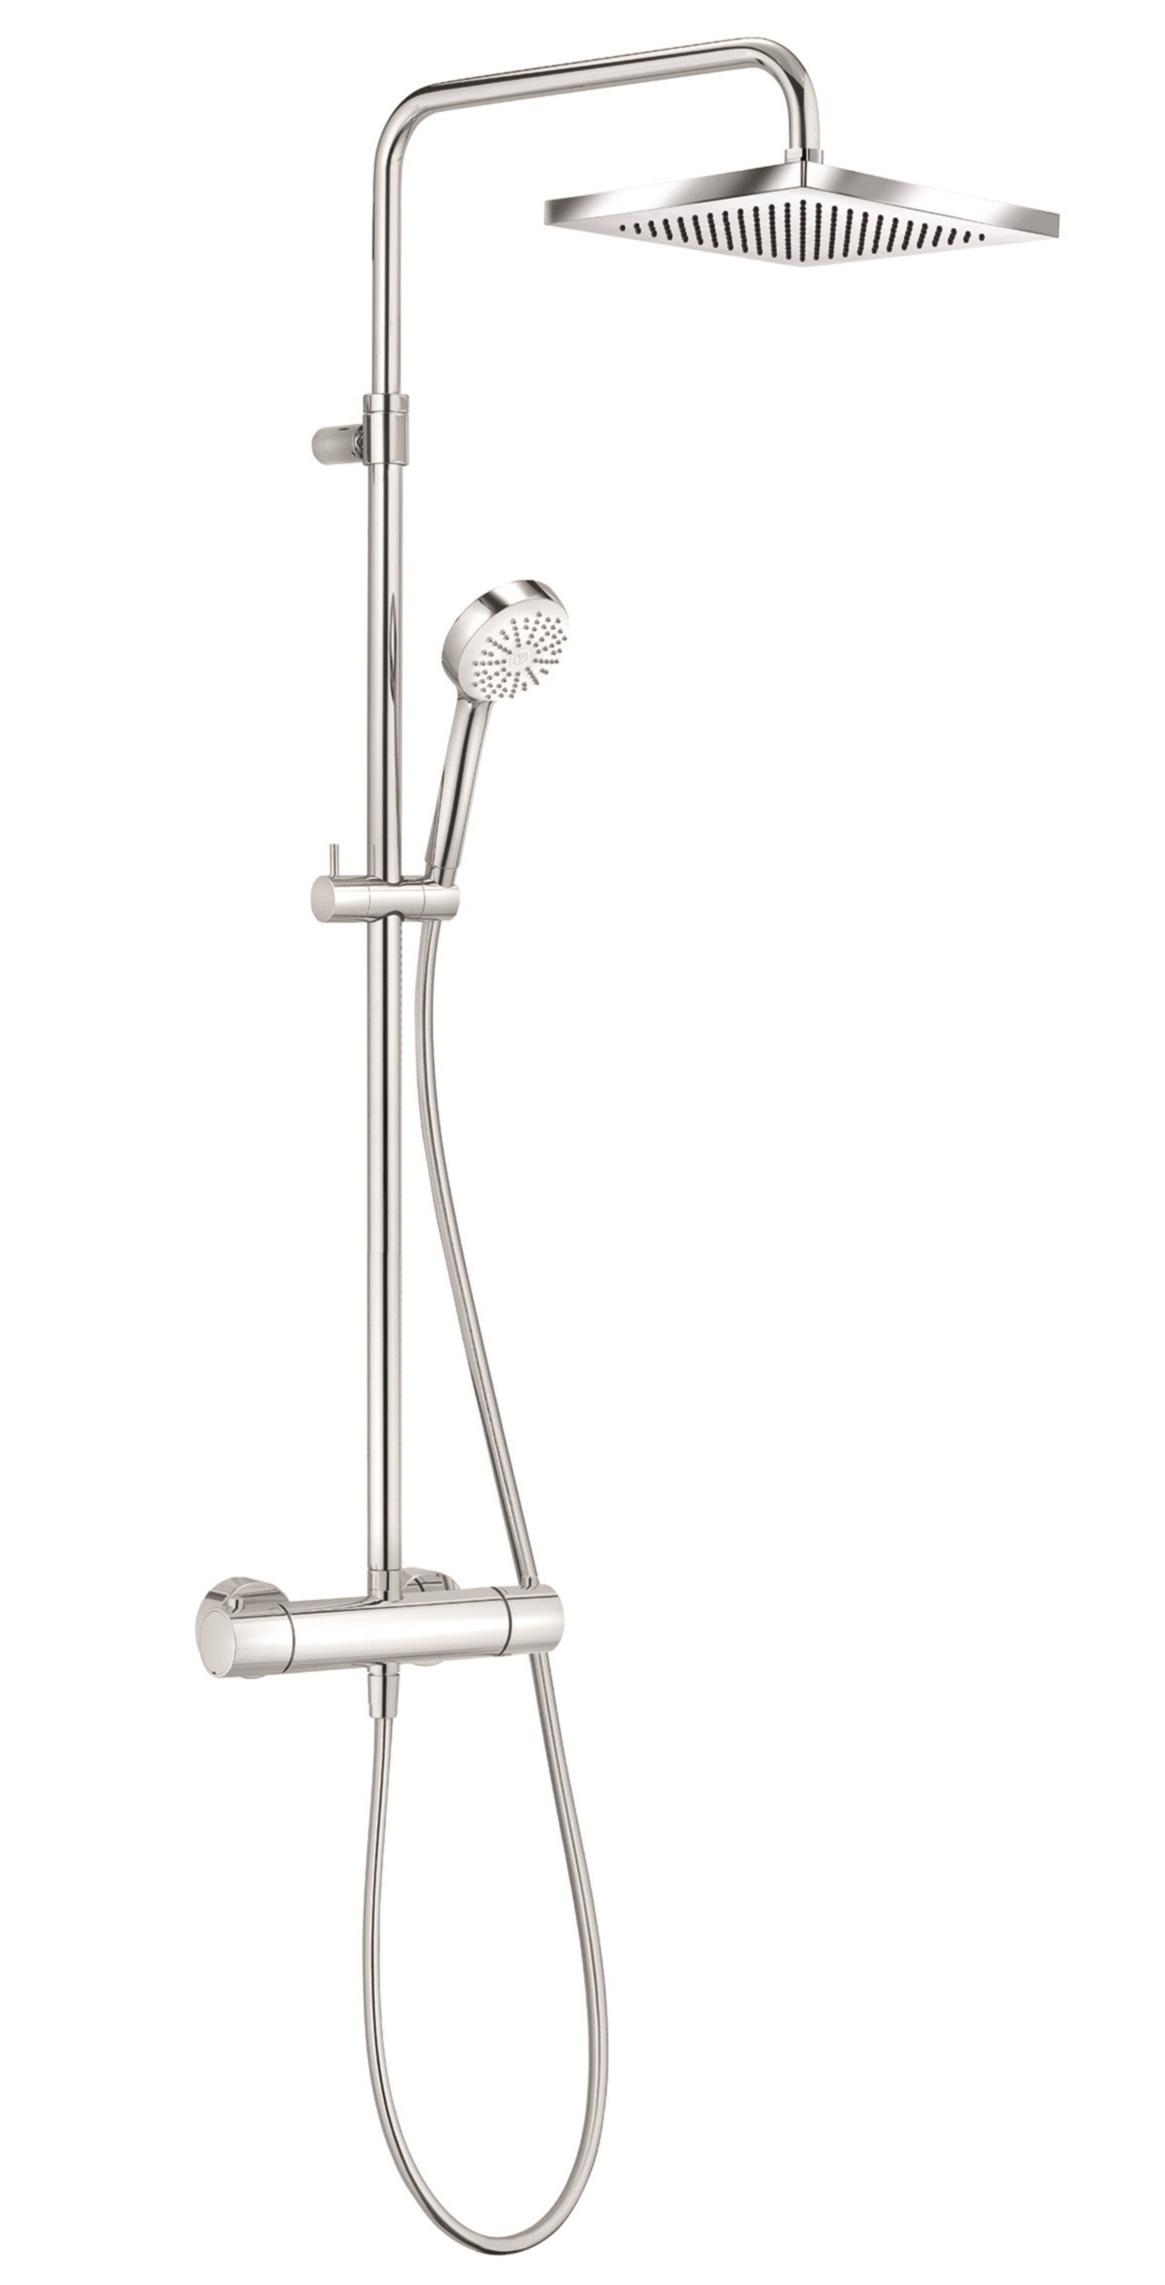 Coloana de dus Kludi Logo 1S Dual Shower cu baterie de dus termostatata poza